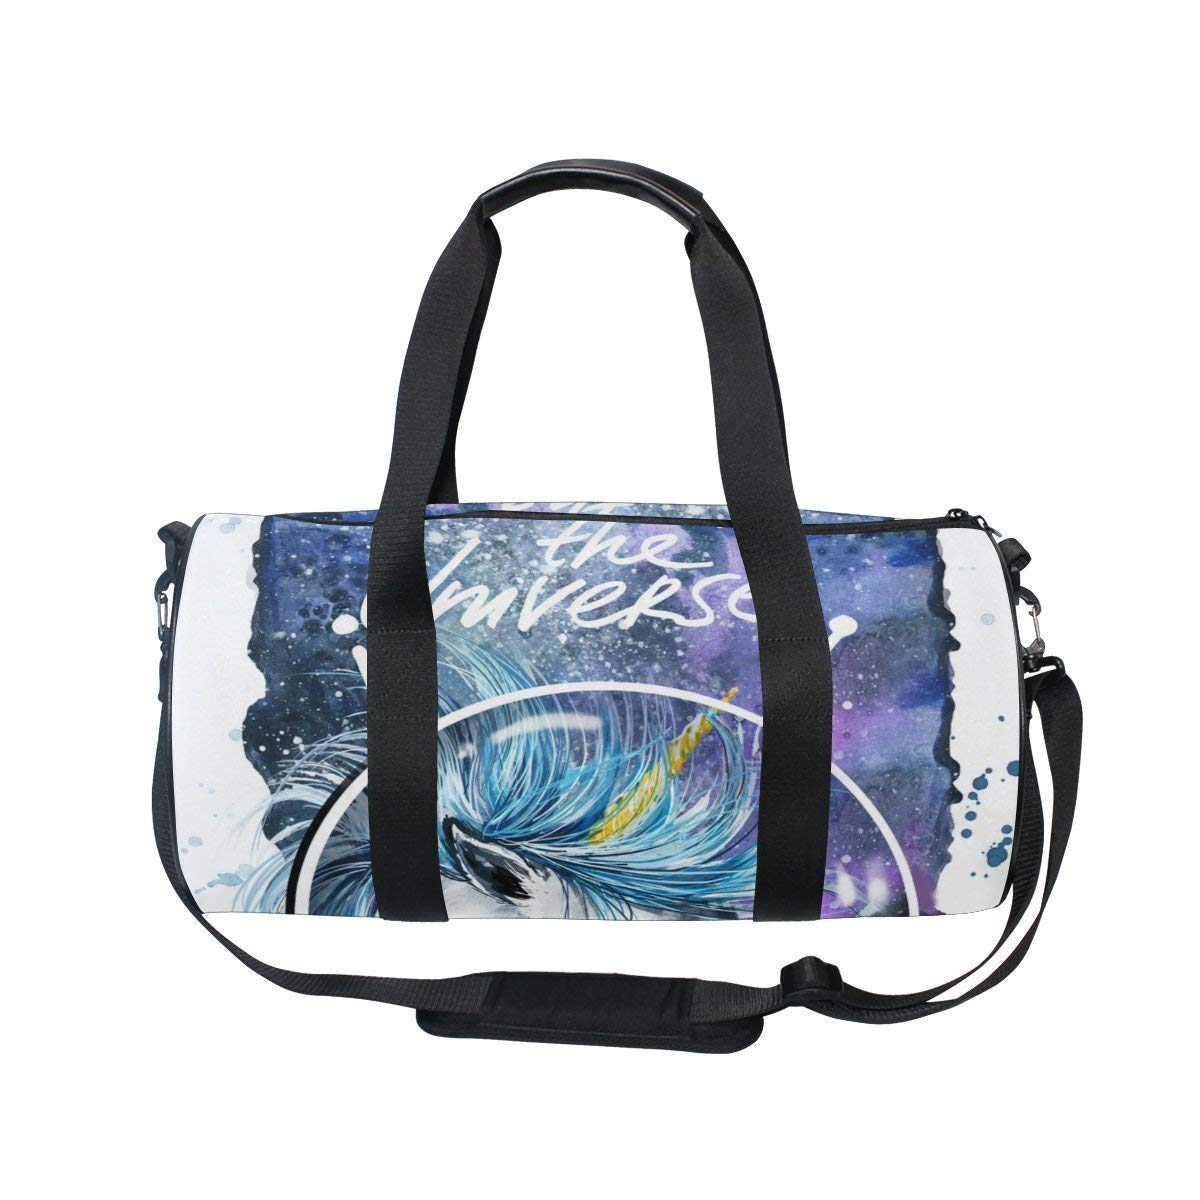 2d0309845f38 Cheap Mens Luggage Duffel Bags, find Mens Luggage Duffel Bags deals ...